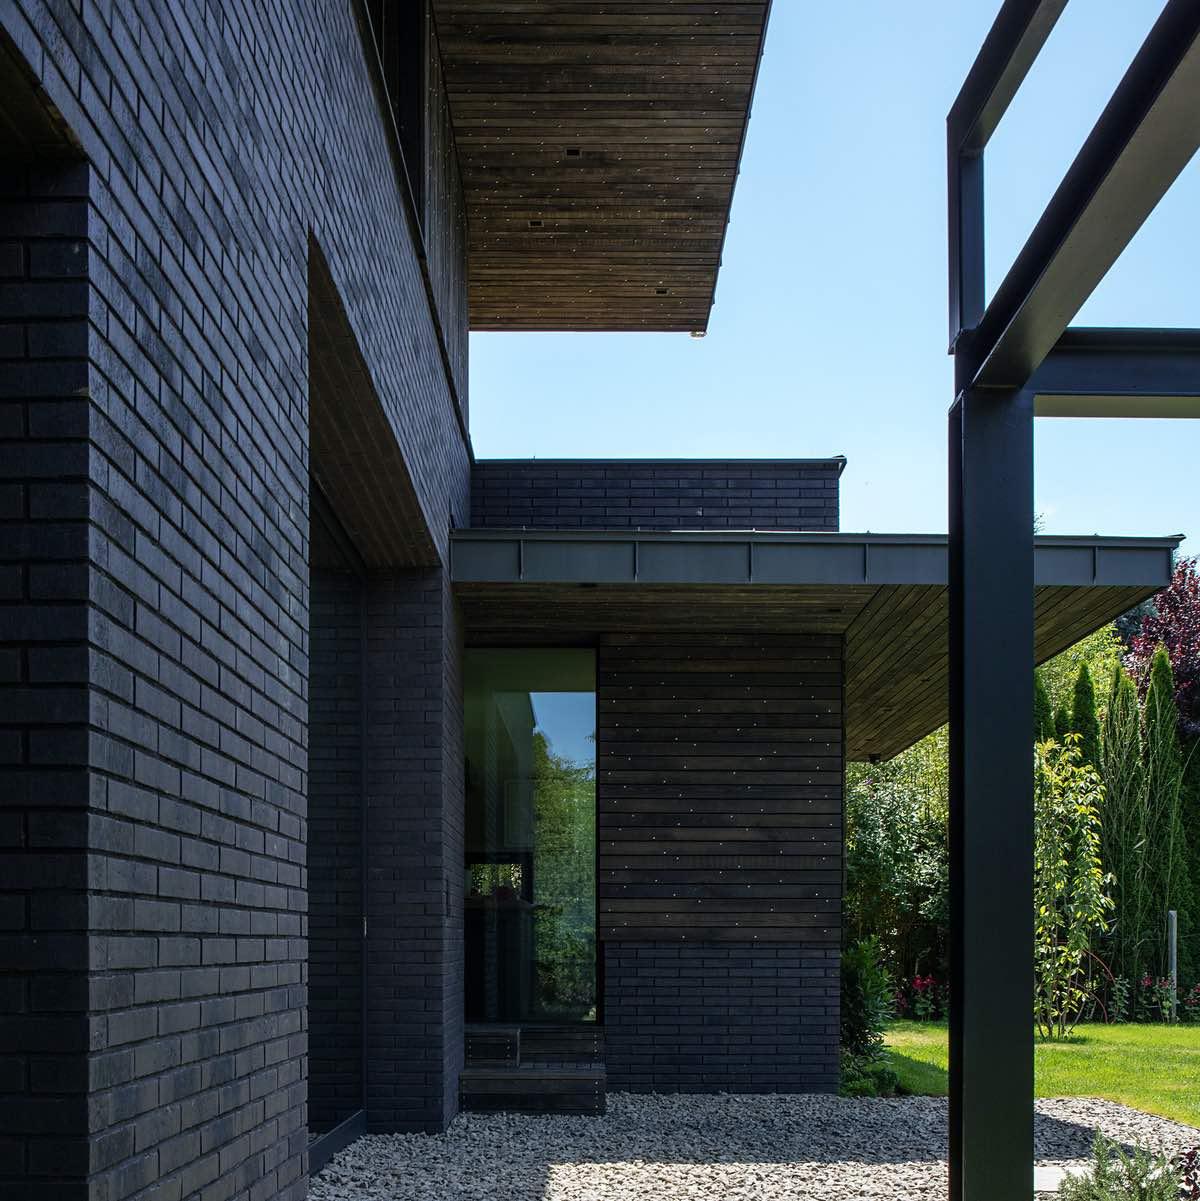 amazing villa with dark brick and glass